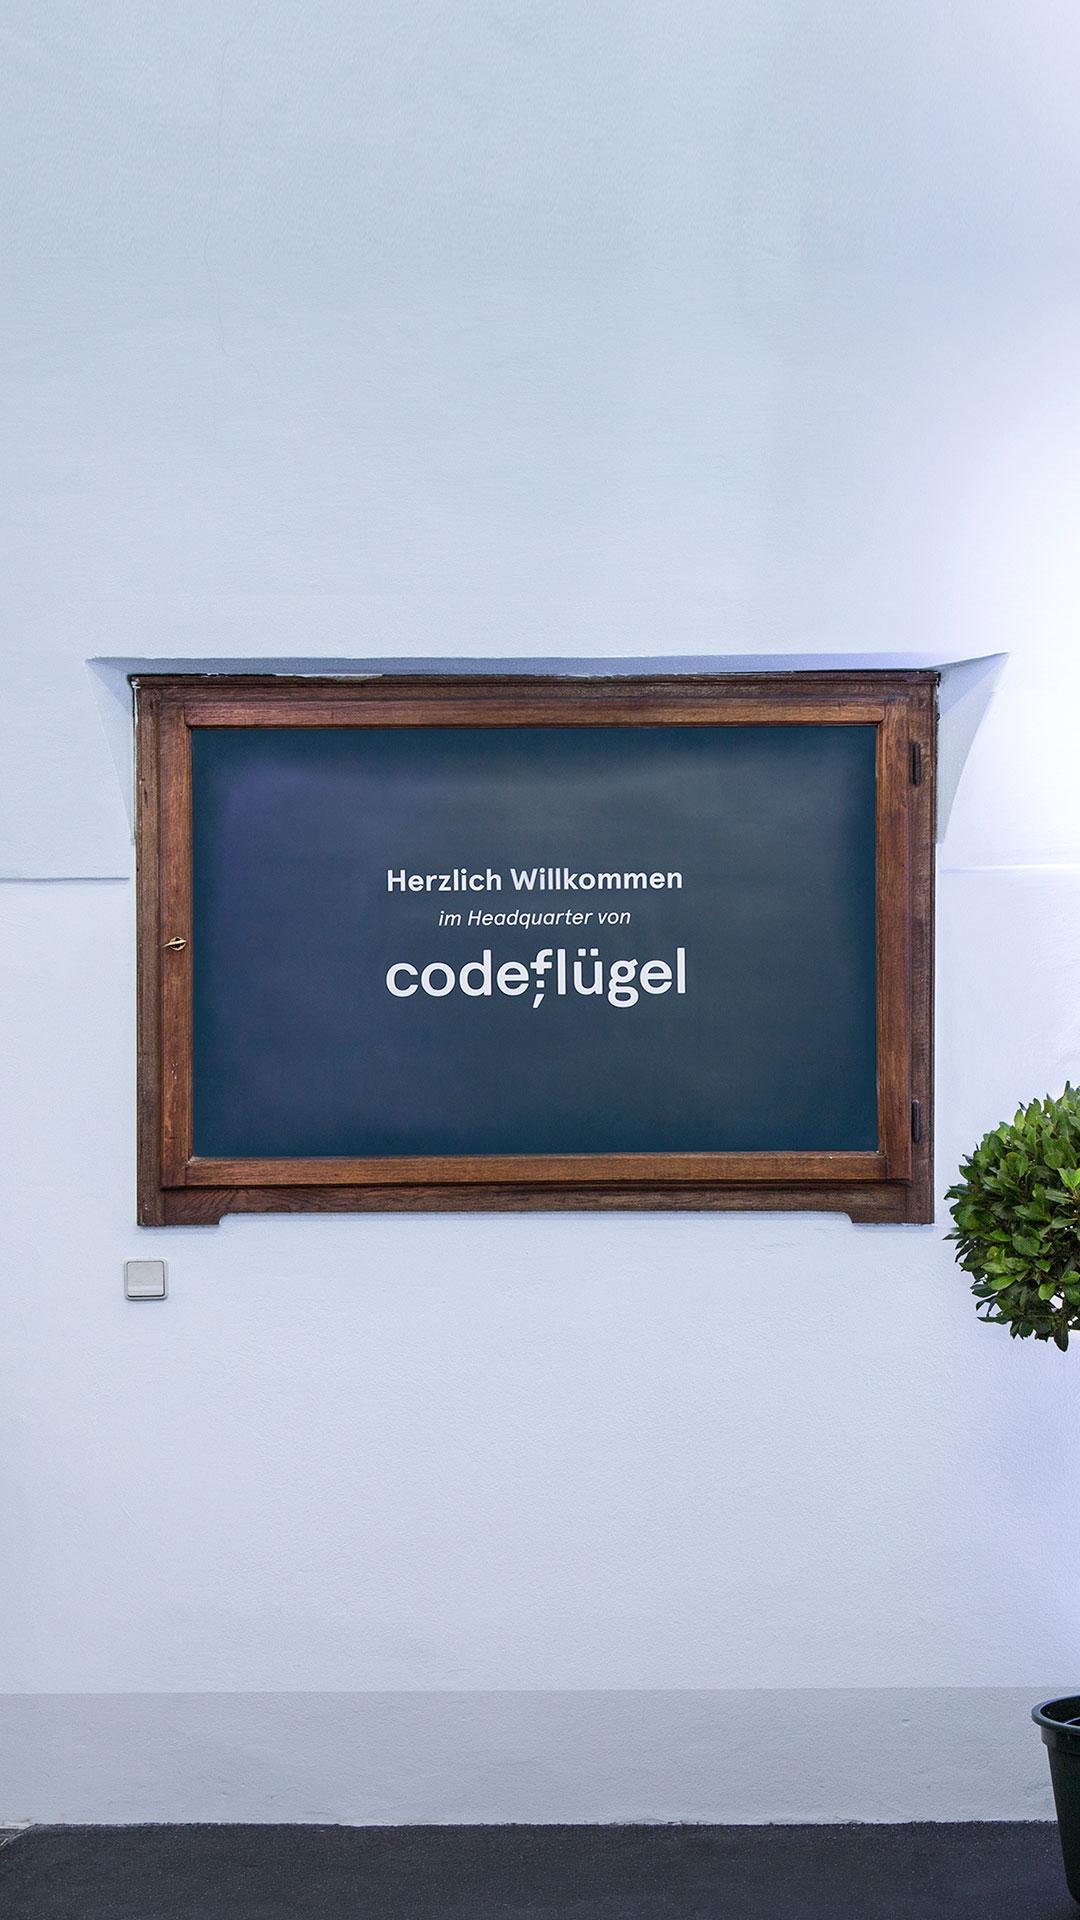 über uns Team Codeflügel Unternehmenskultur